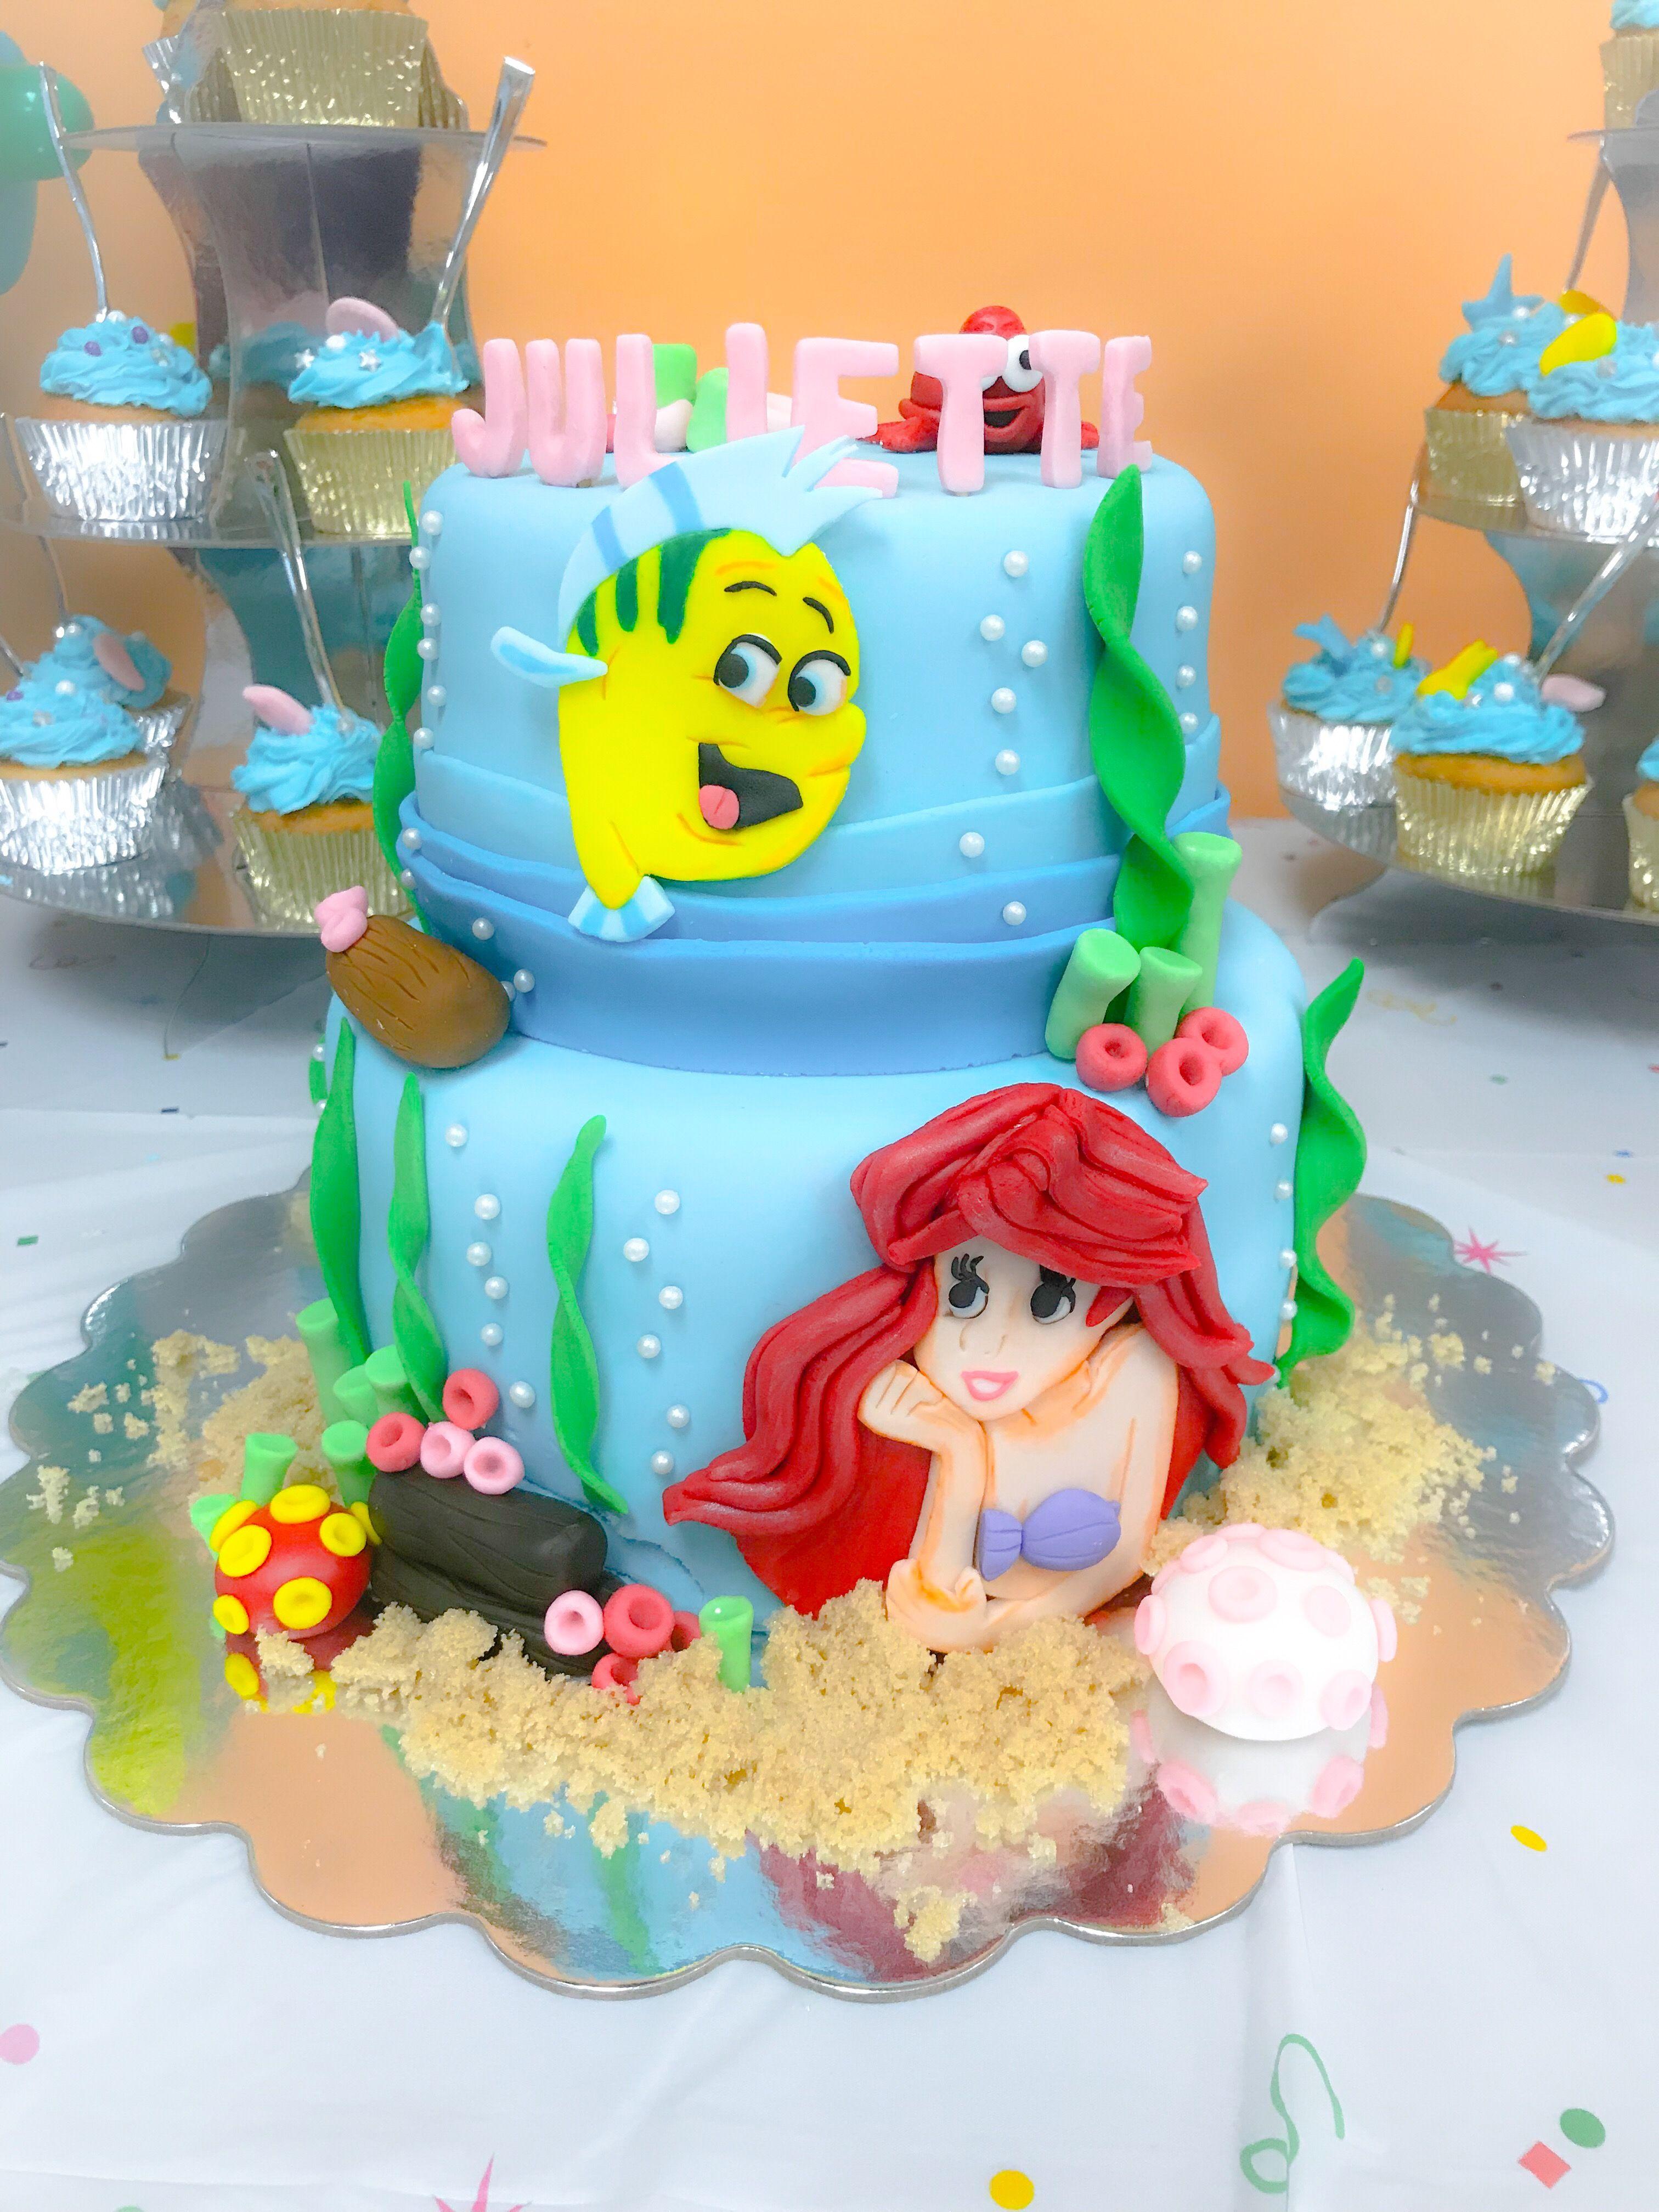 Disney ariel birthday cake fondant princess ariel cake